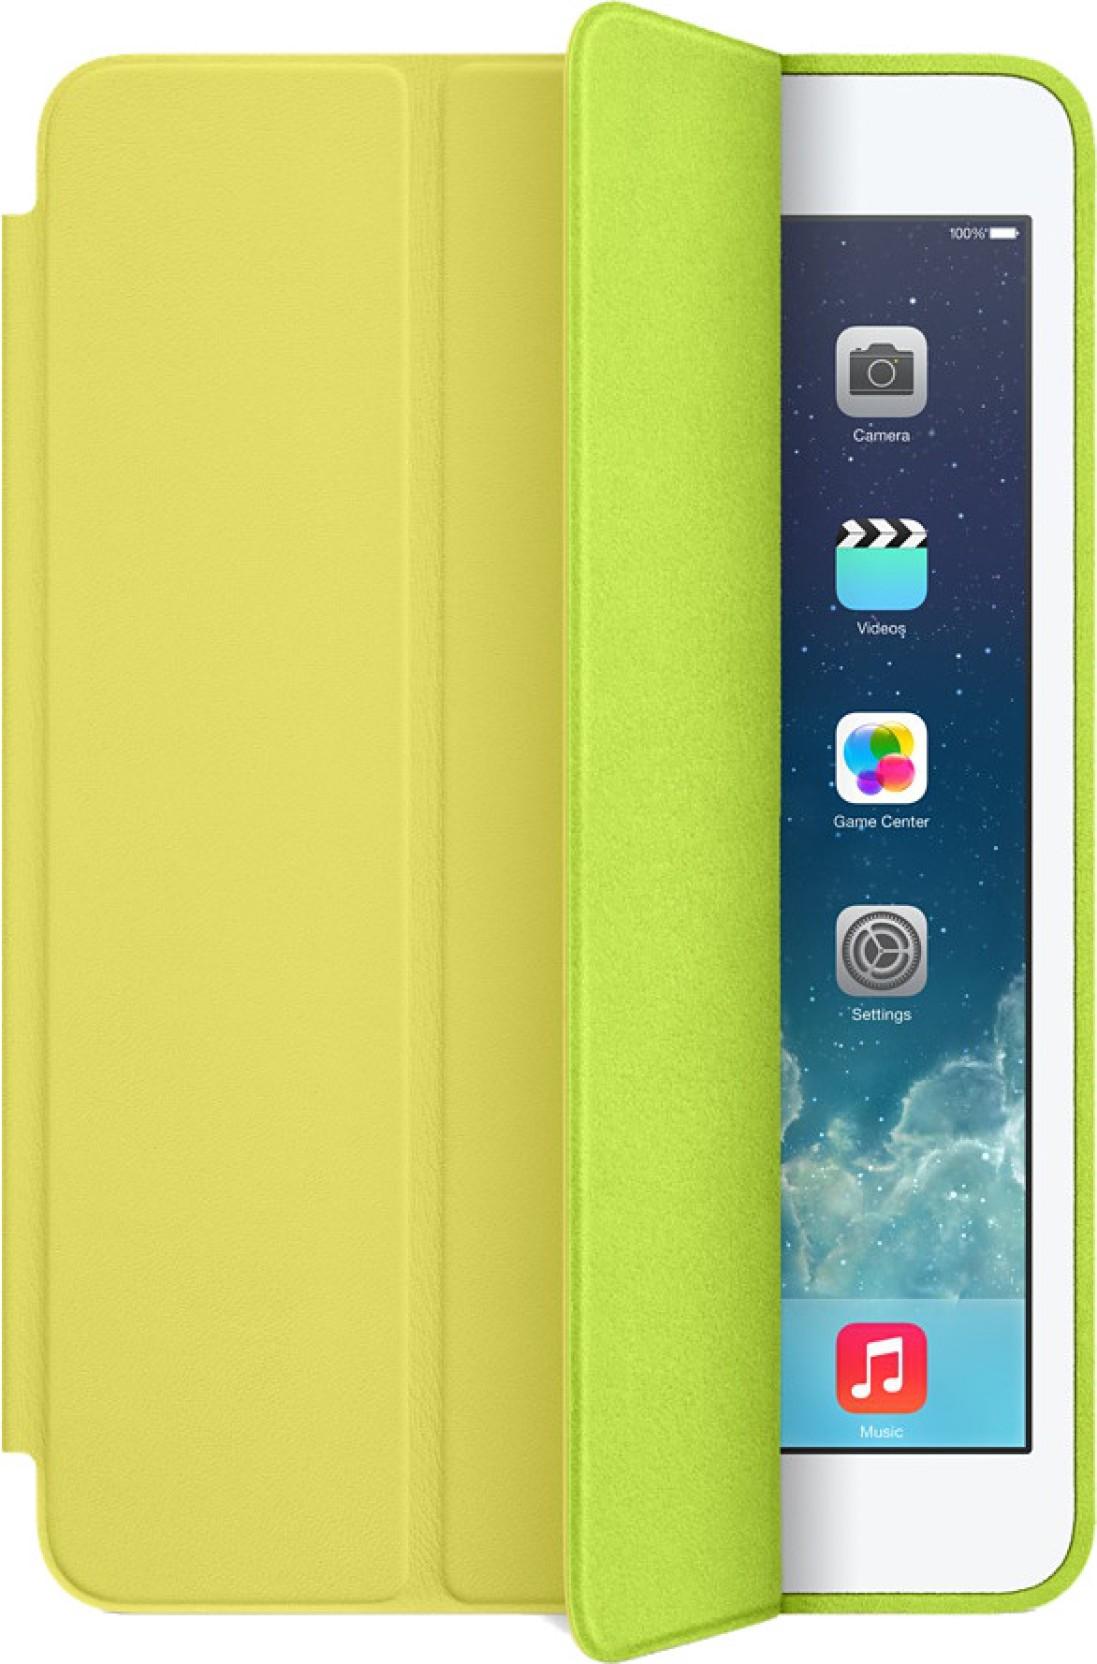 Ipad mini case that looks like a book 5